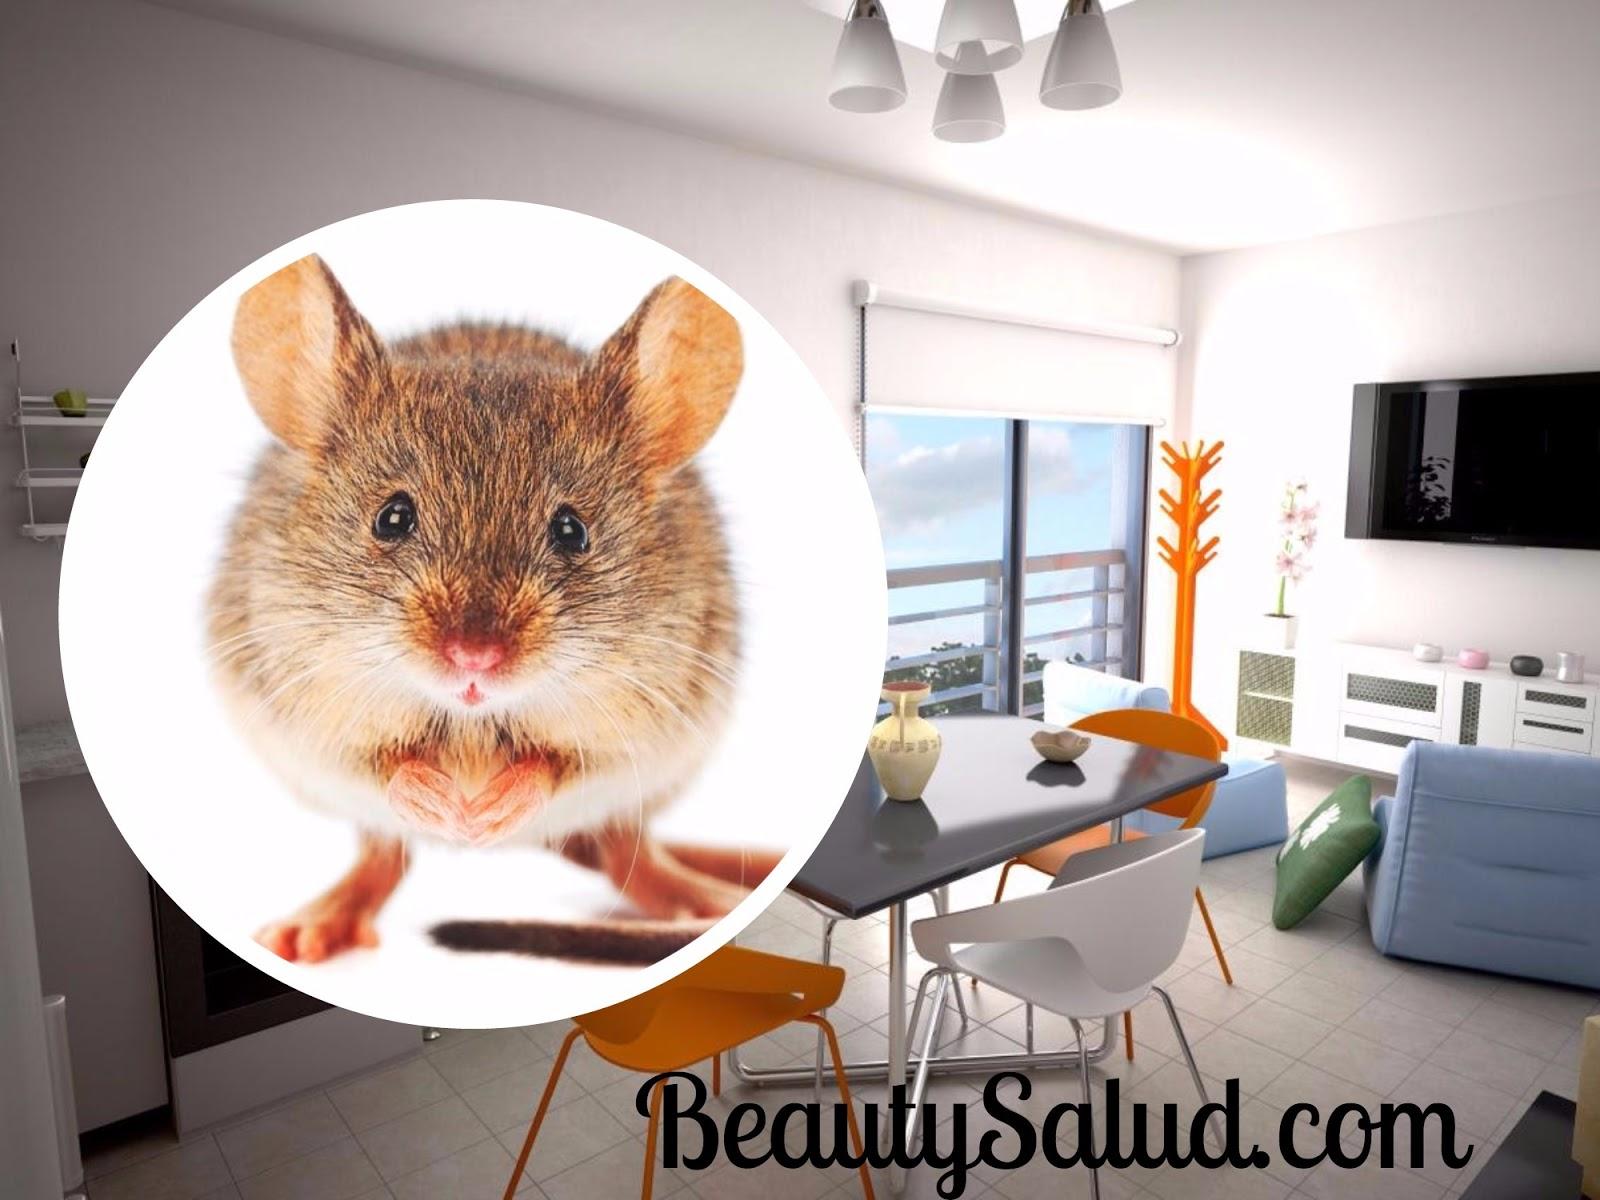 Ratones En Casa. Stunning Divertida Mascota Gatito Gato Jugando Ratn ...